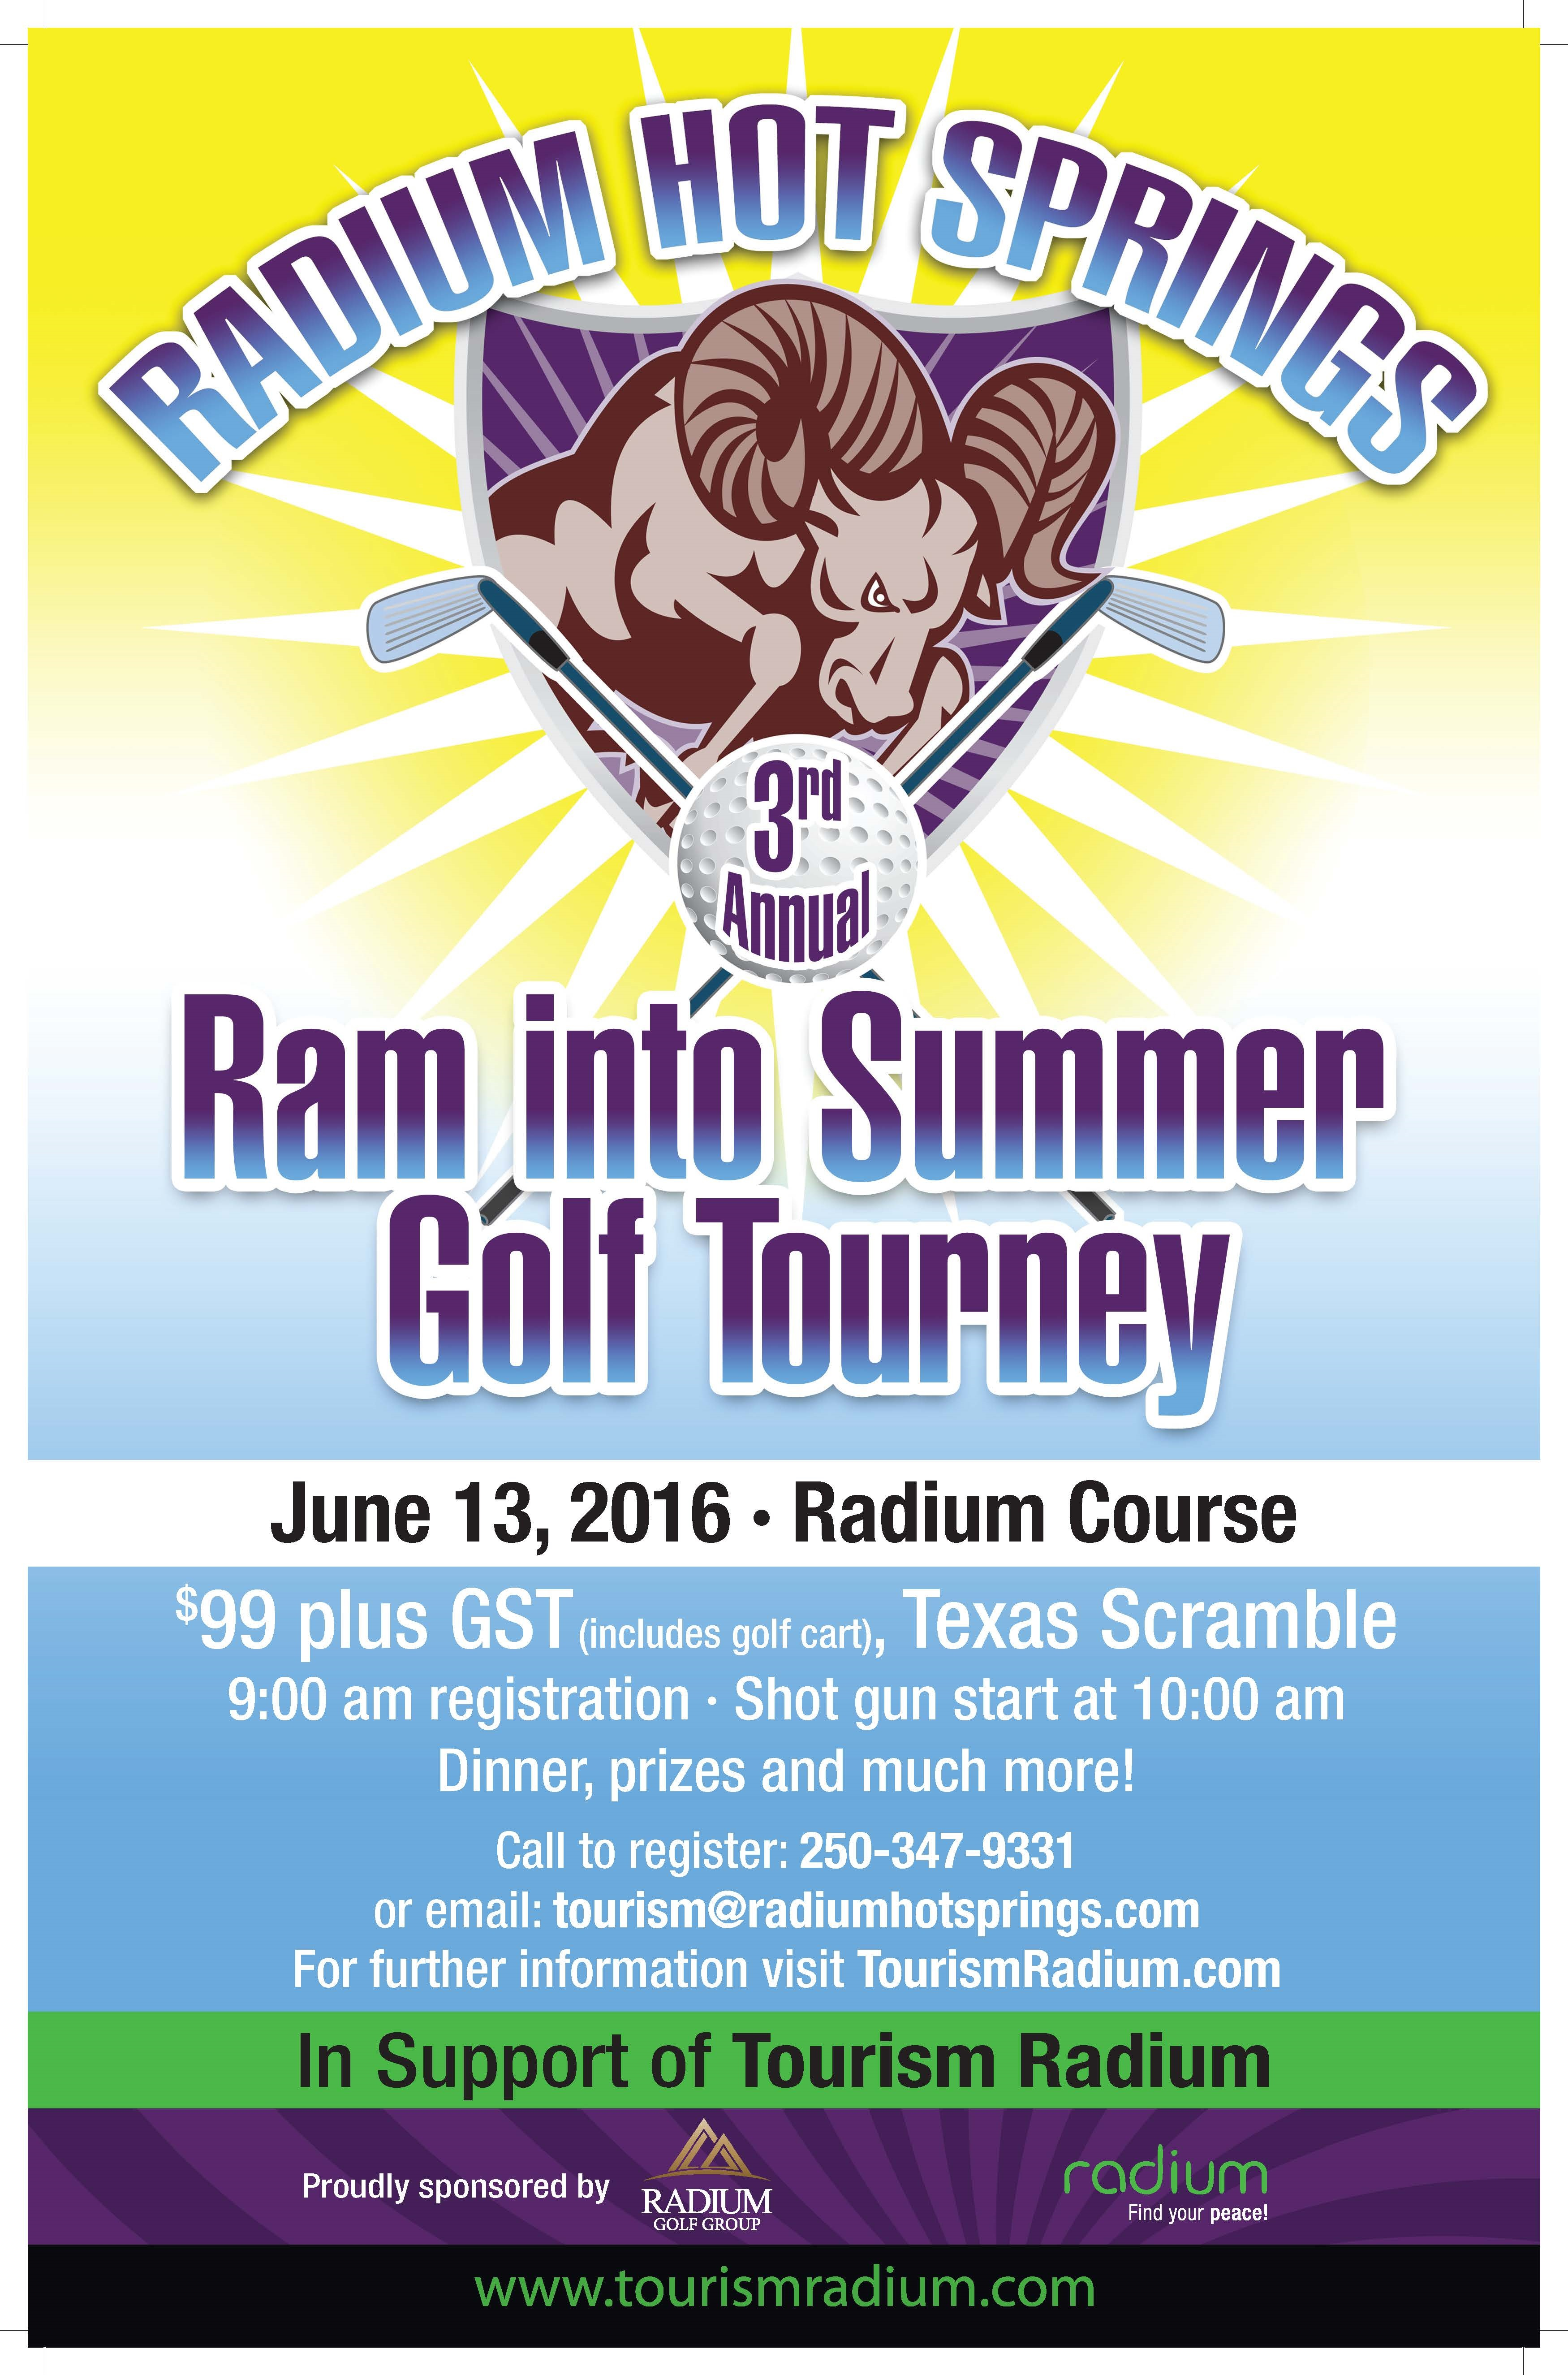 Ram into Summer Golf Tourney